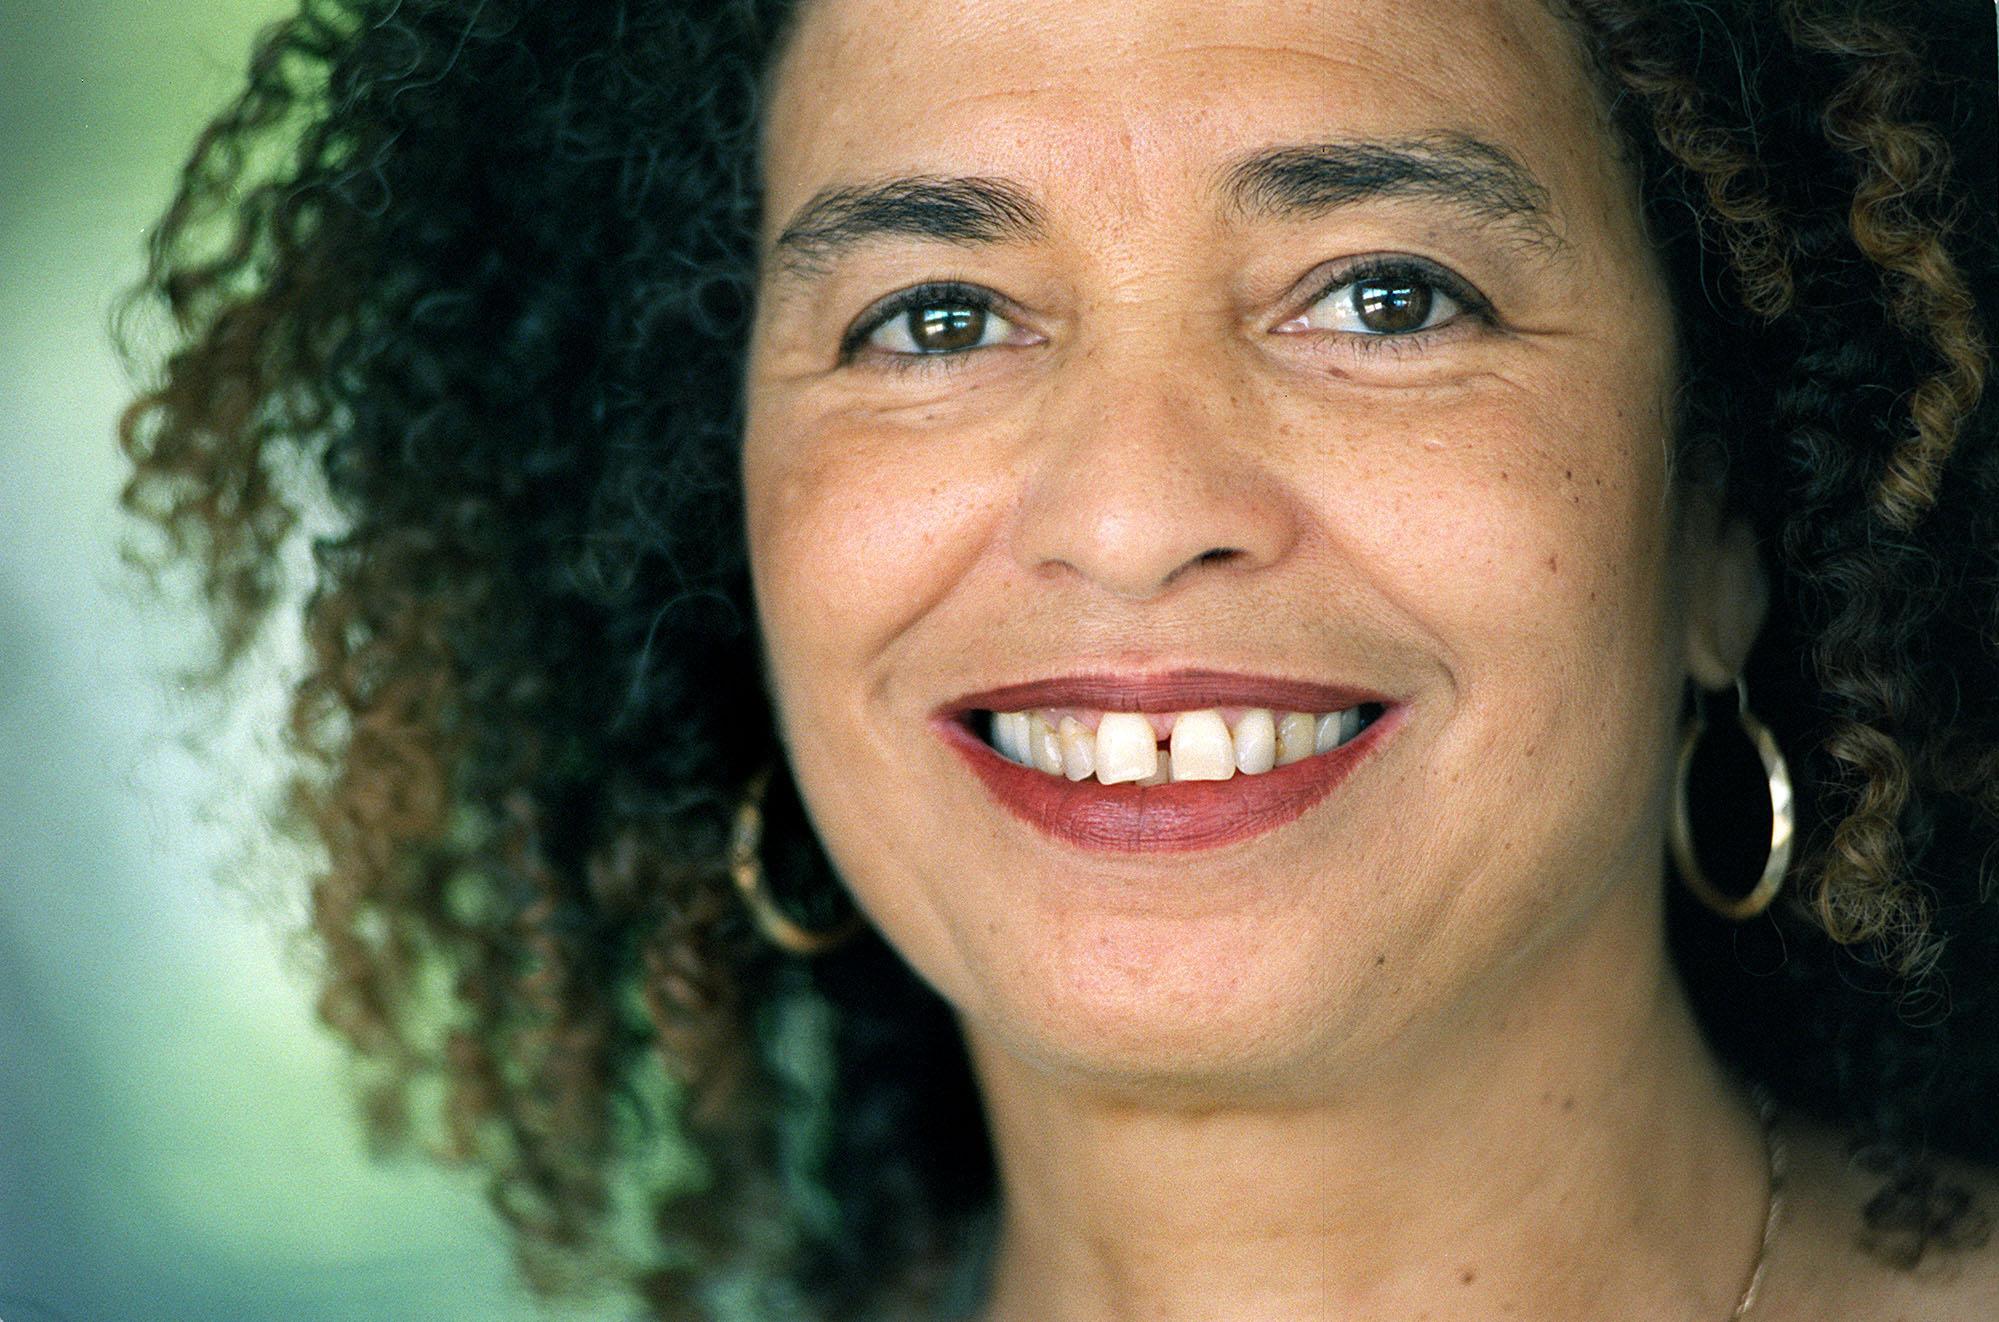 Angela Davis S Afro Images Politics Fashion And Nostalgia Review